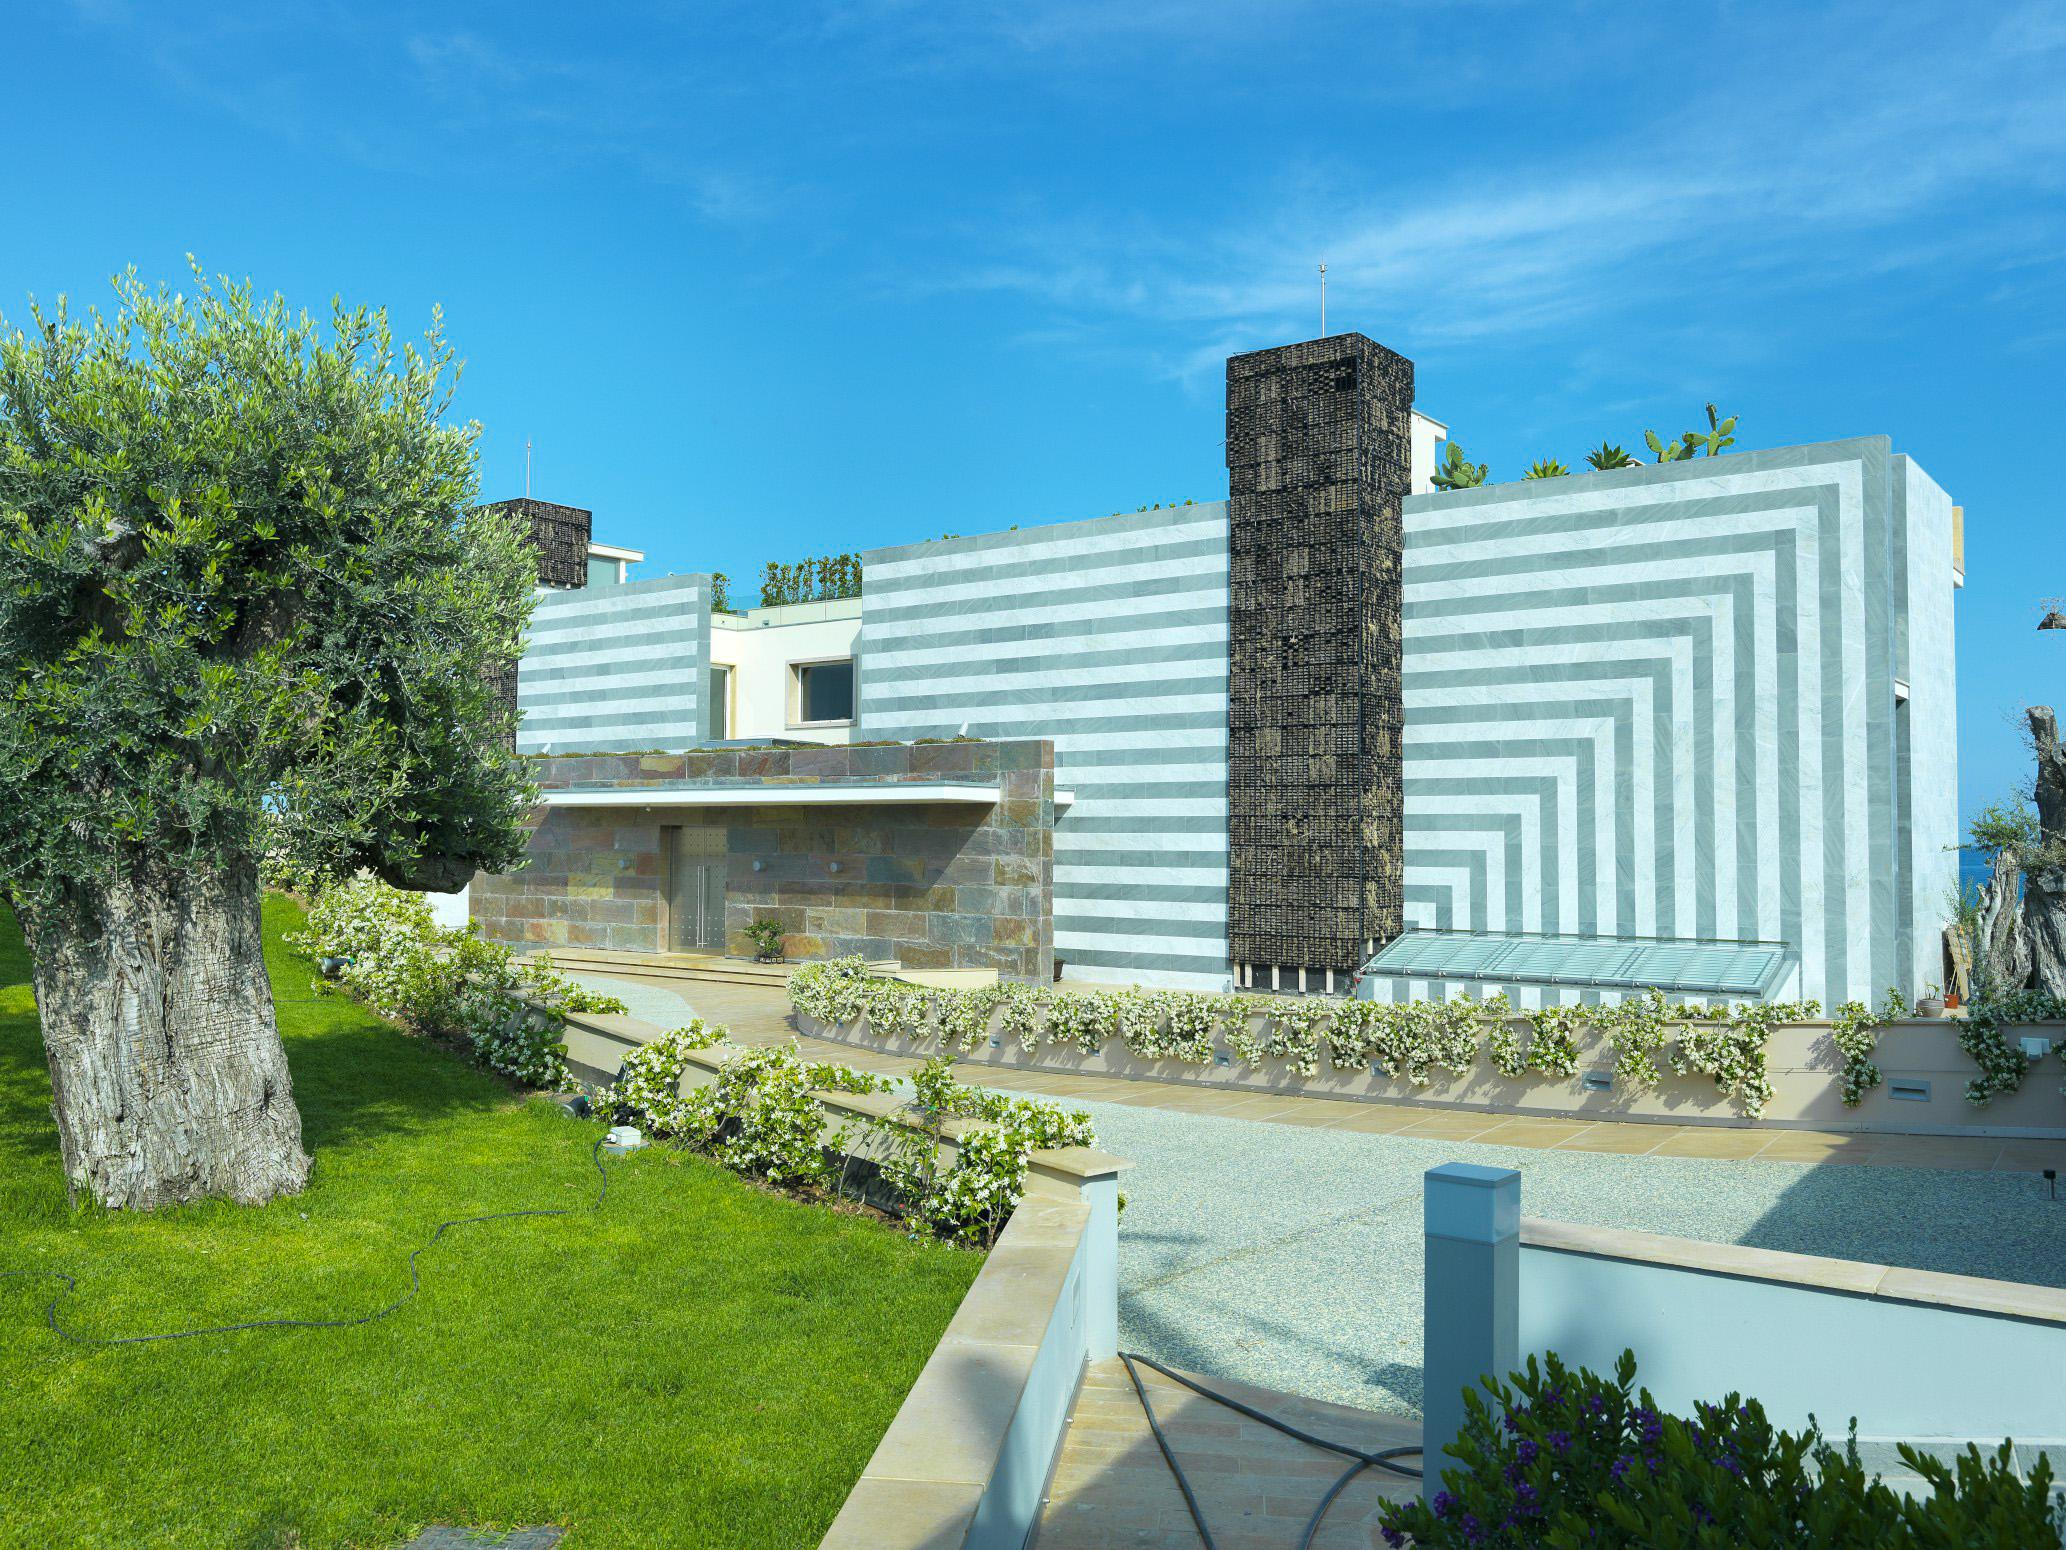 roberto-vaglietti-residence-k1000edited